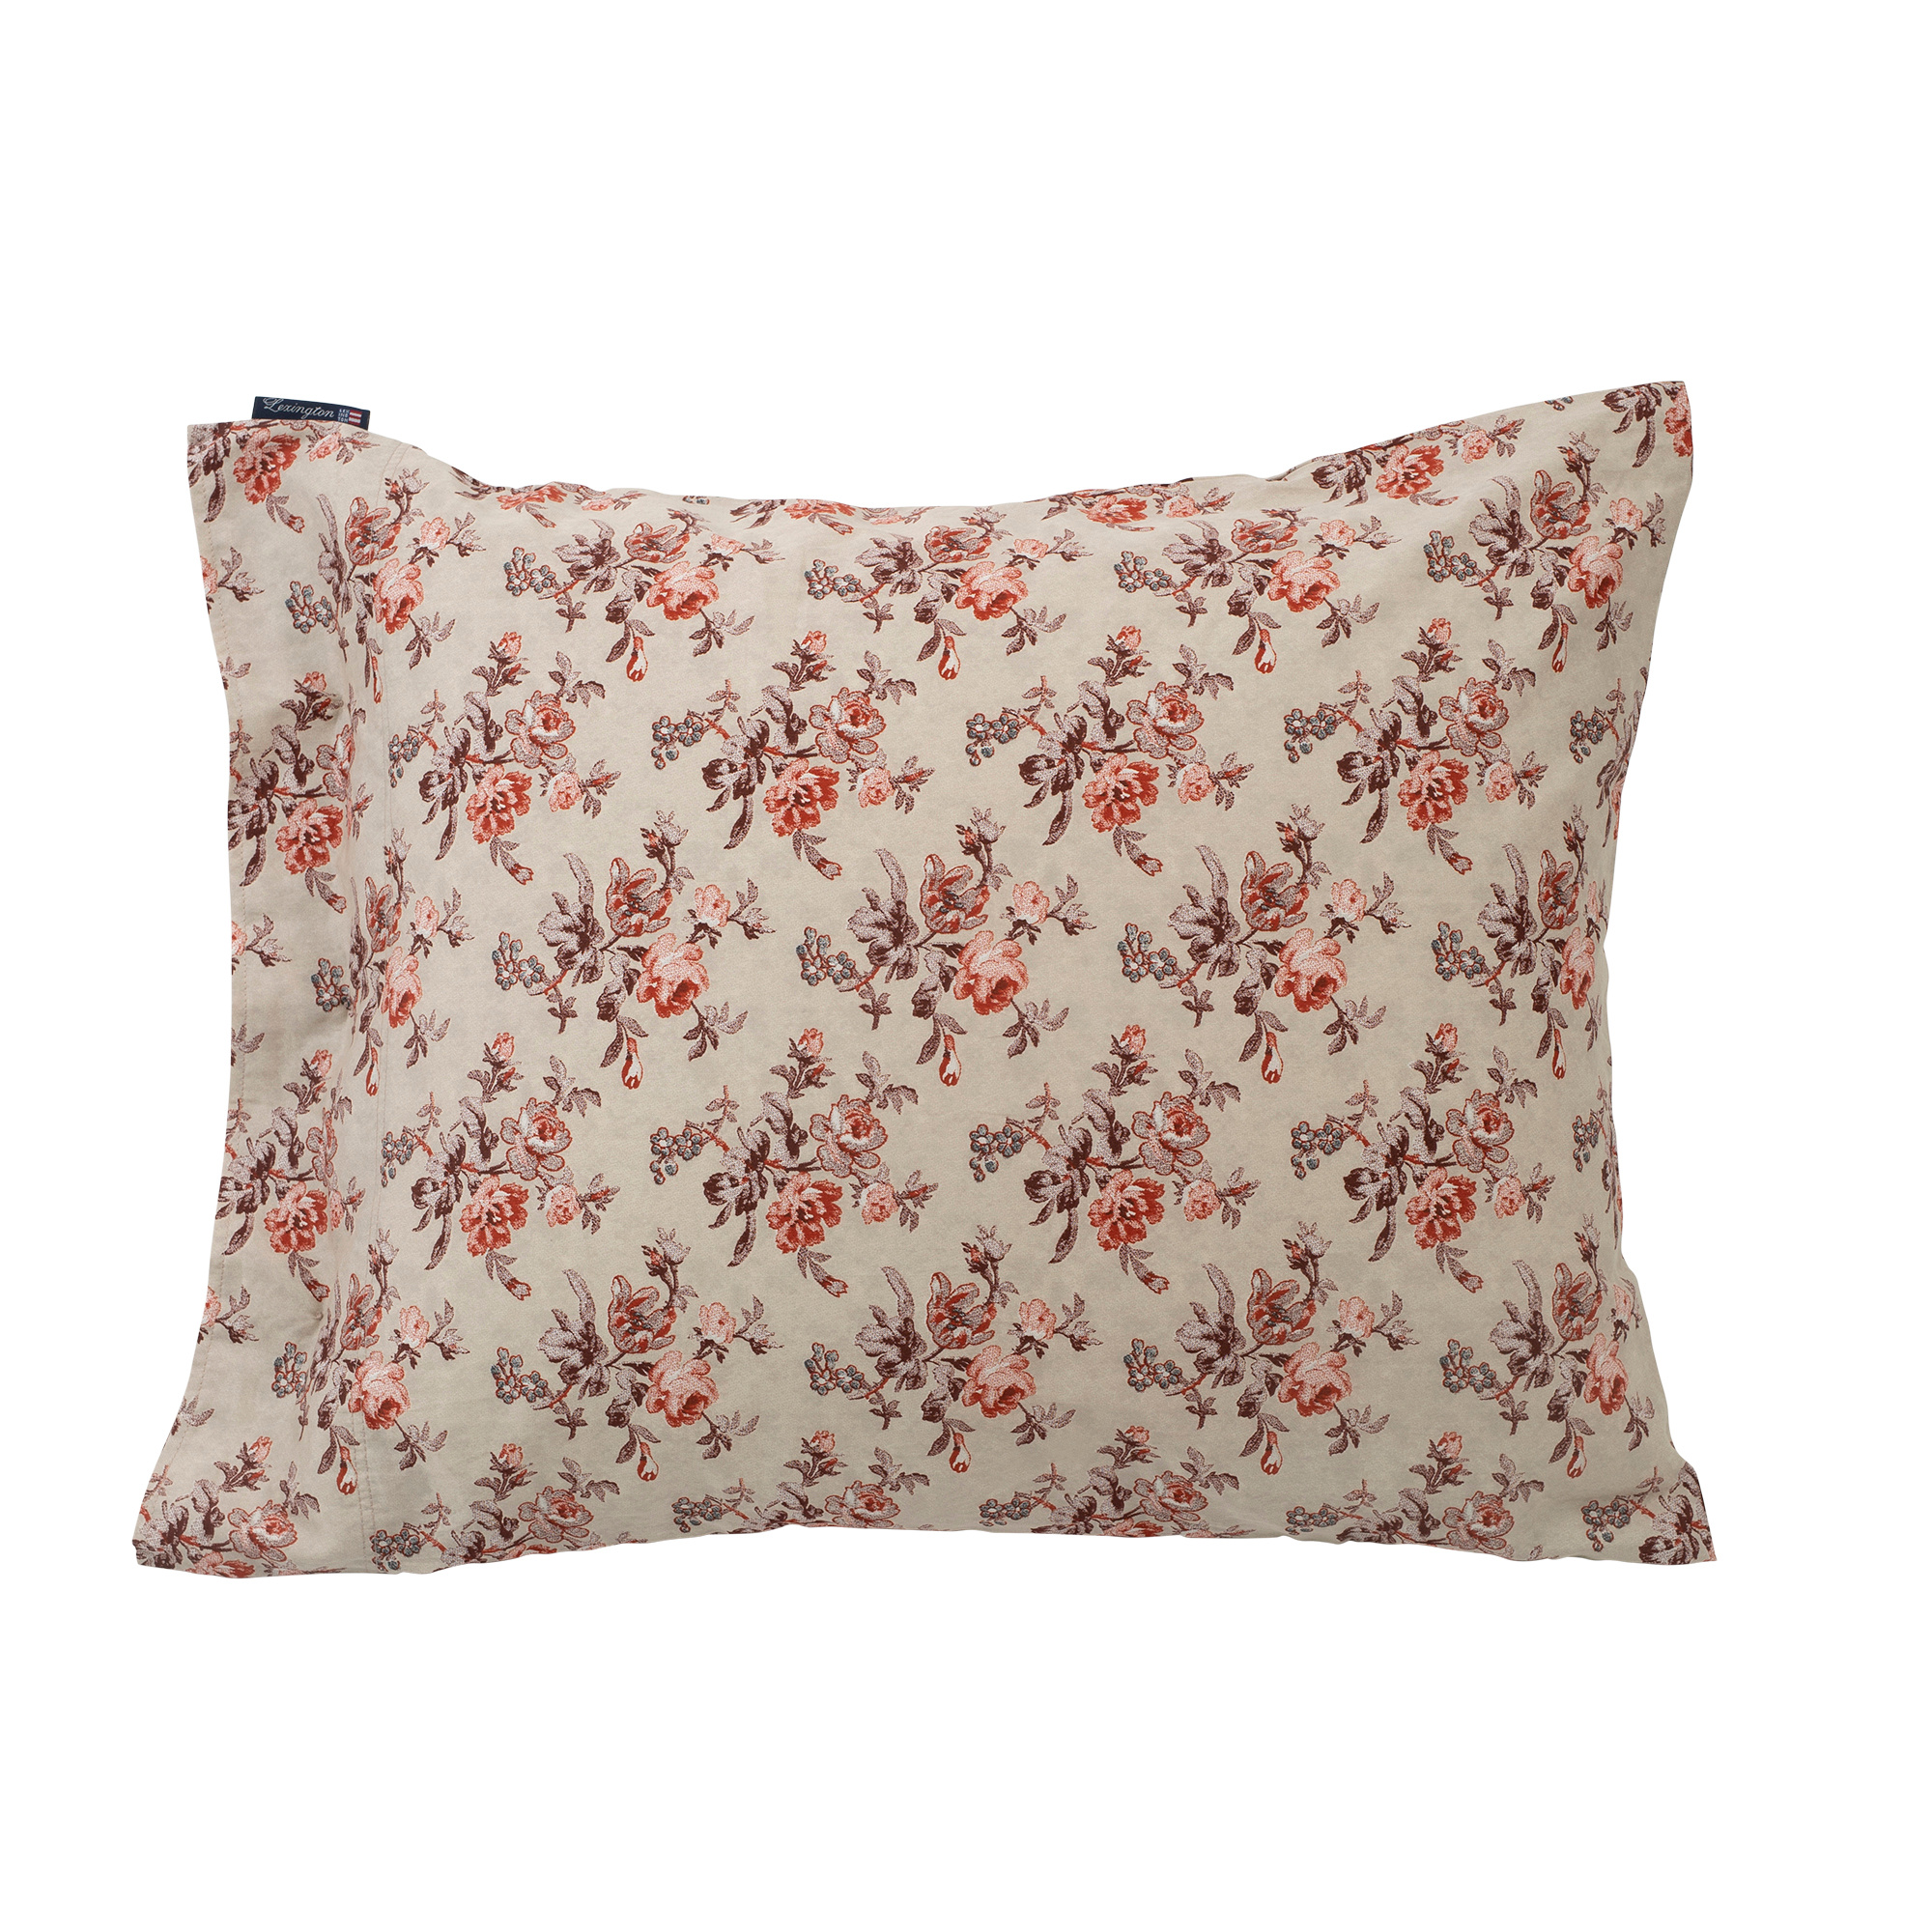 Printed Floral Sateen Pillowcase, Autumn Floral